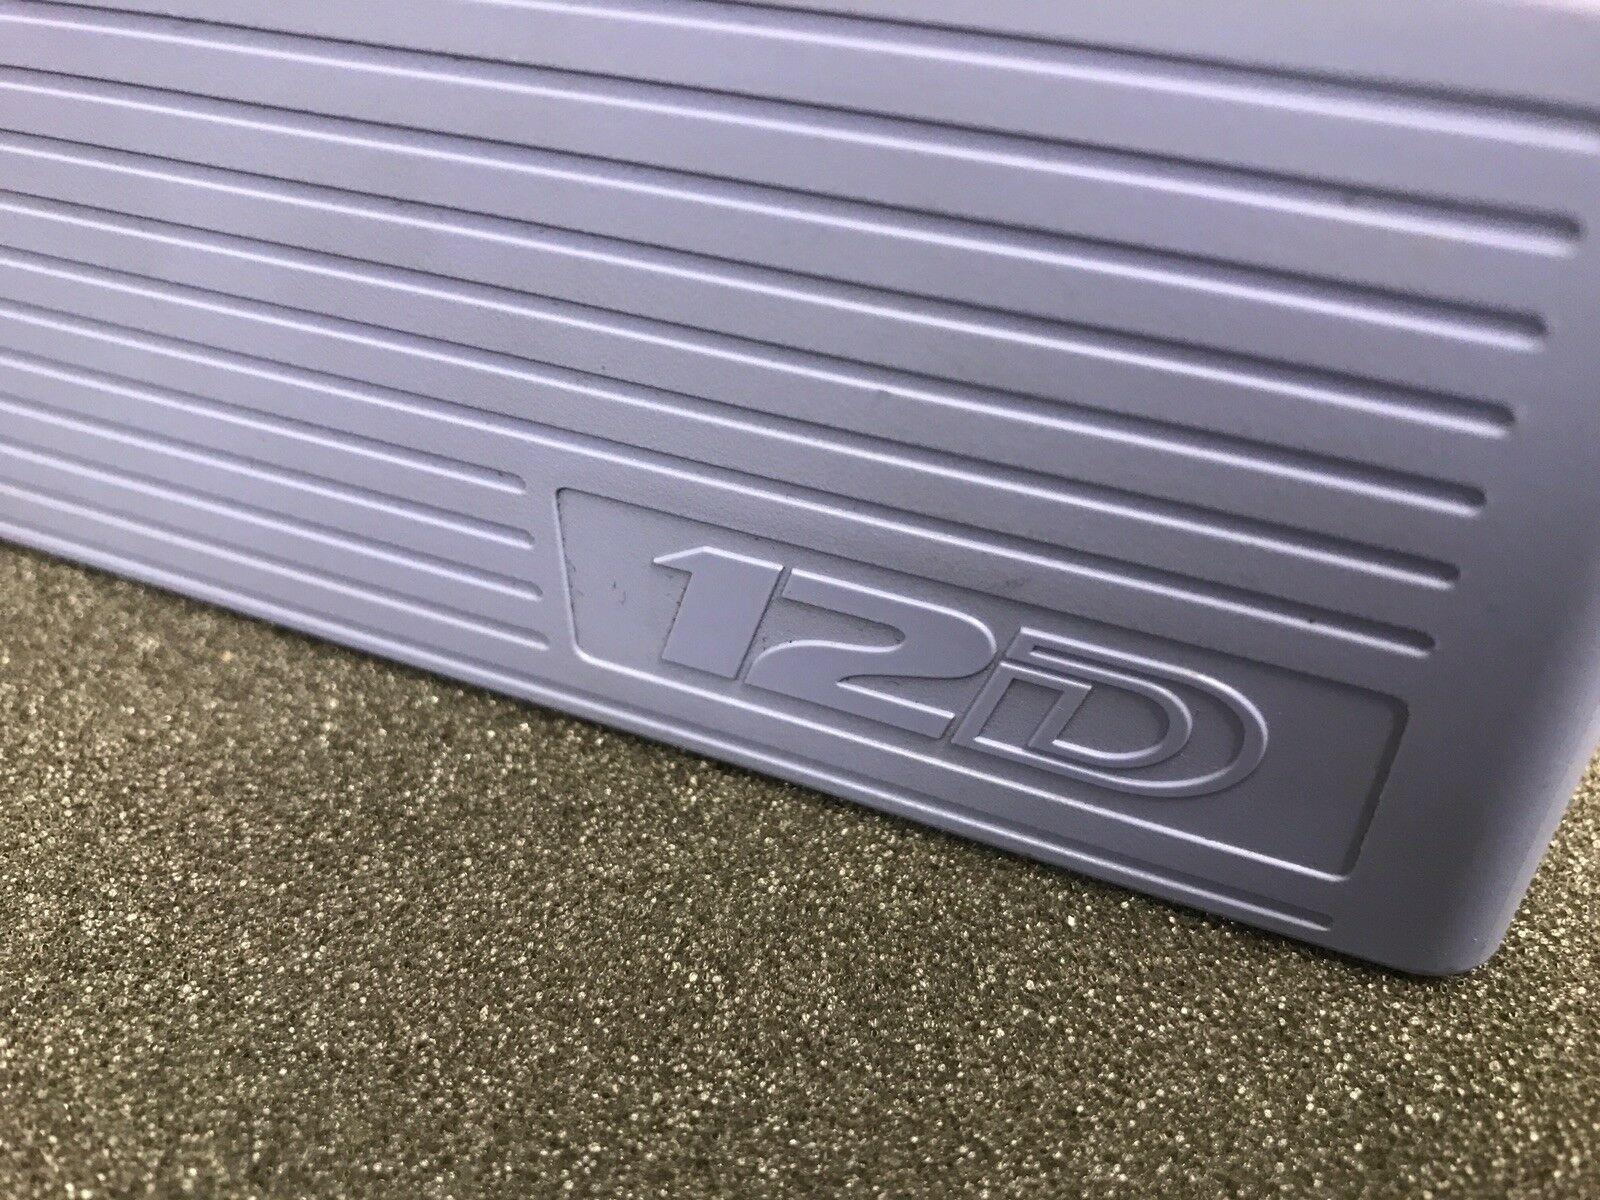 Alpine 12 Disc Add On Car Cd Changer Stacker Shuffler Magazine Cartridge Only